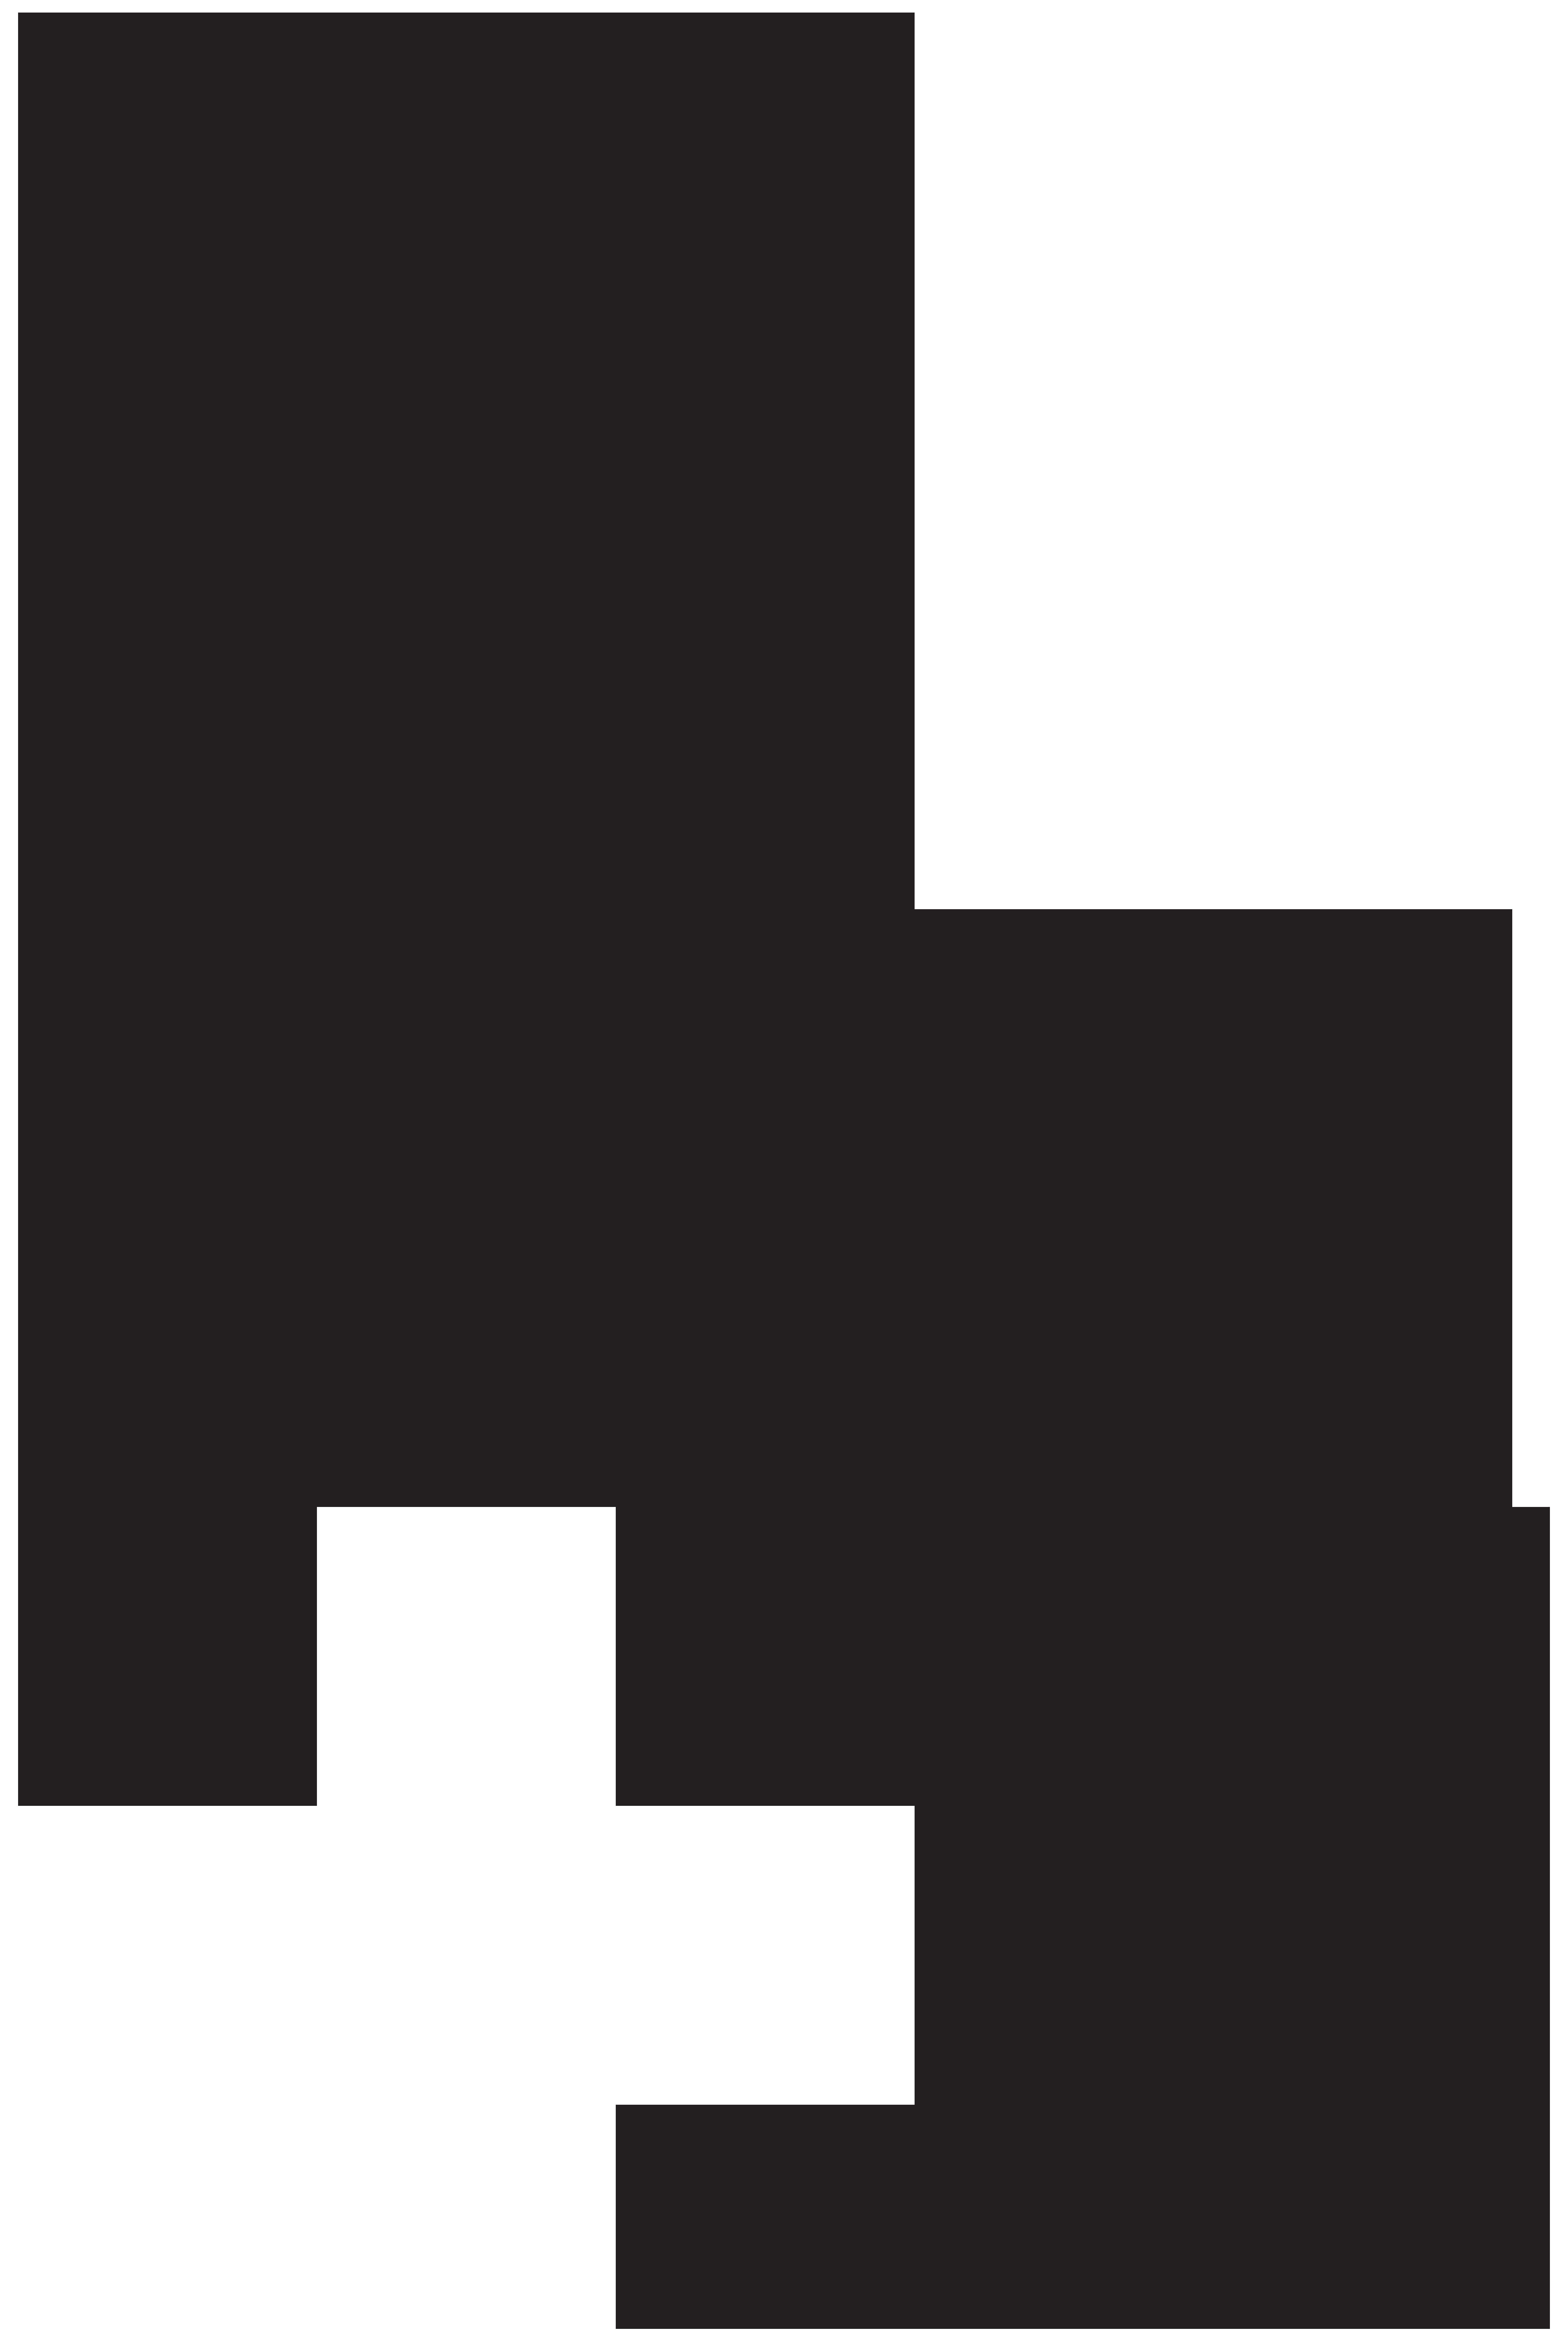 5373x8000 Unicorn Silhouette Png Clip Art Image Free Silhouette Cameo Cut